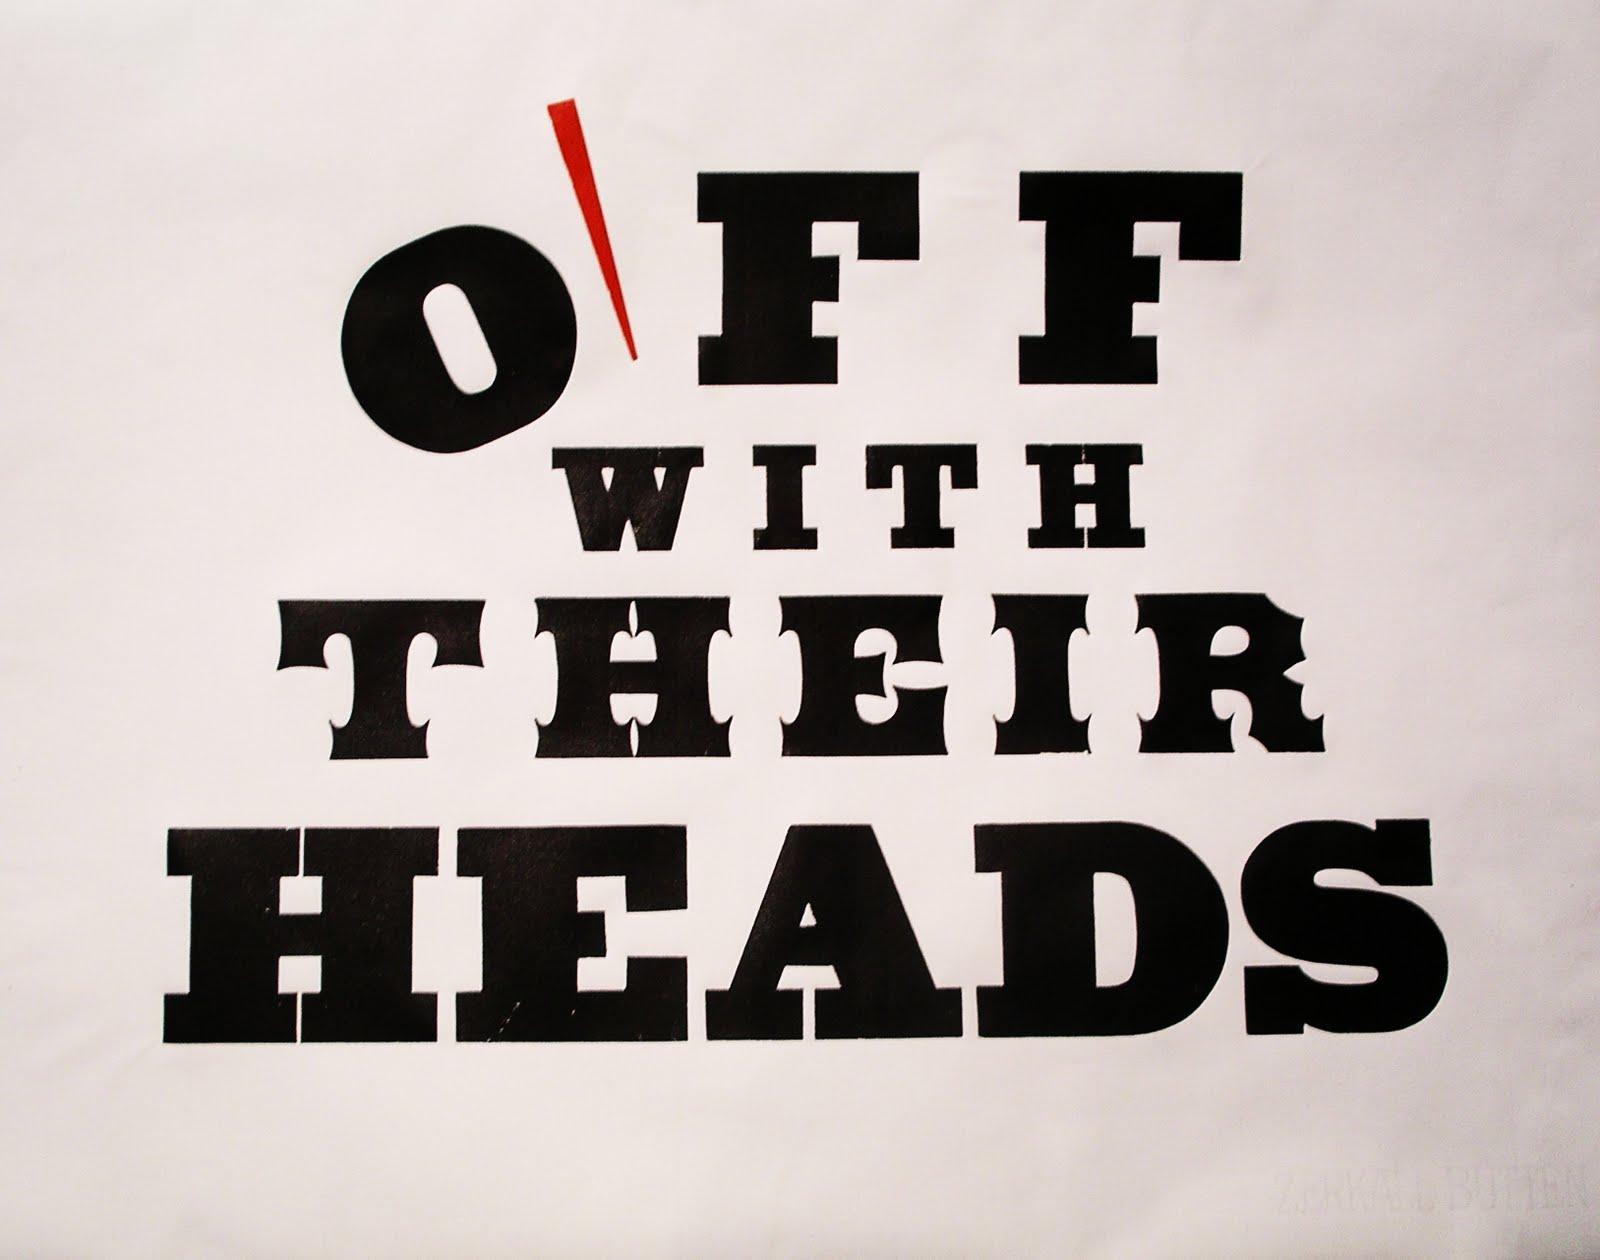 Queen Of Hearts Alice In Wonderland Off With Their Heads Off With Their Heads - Peter